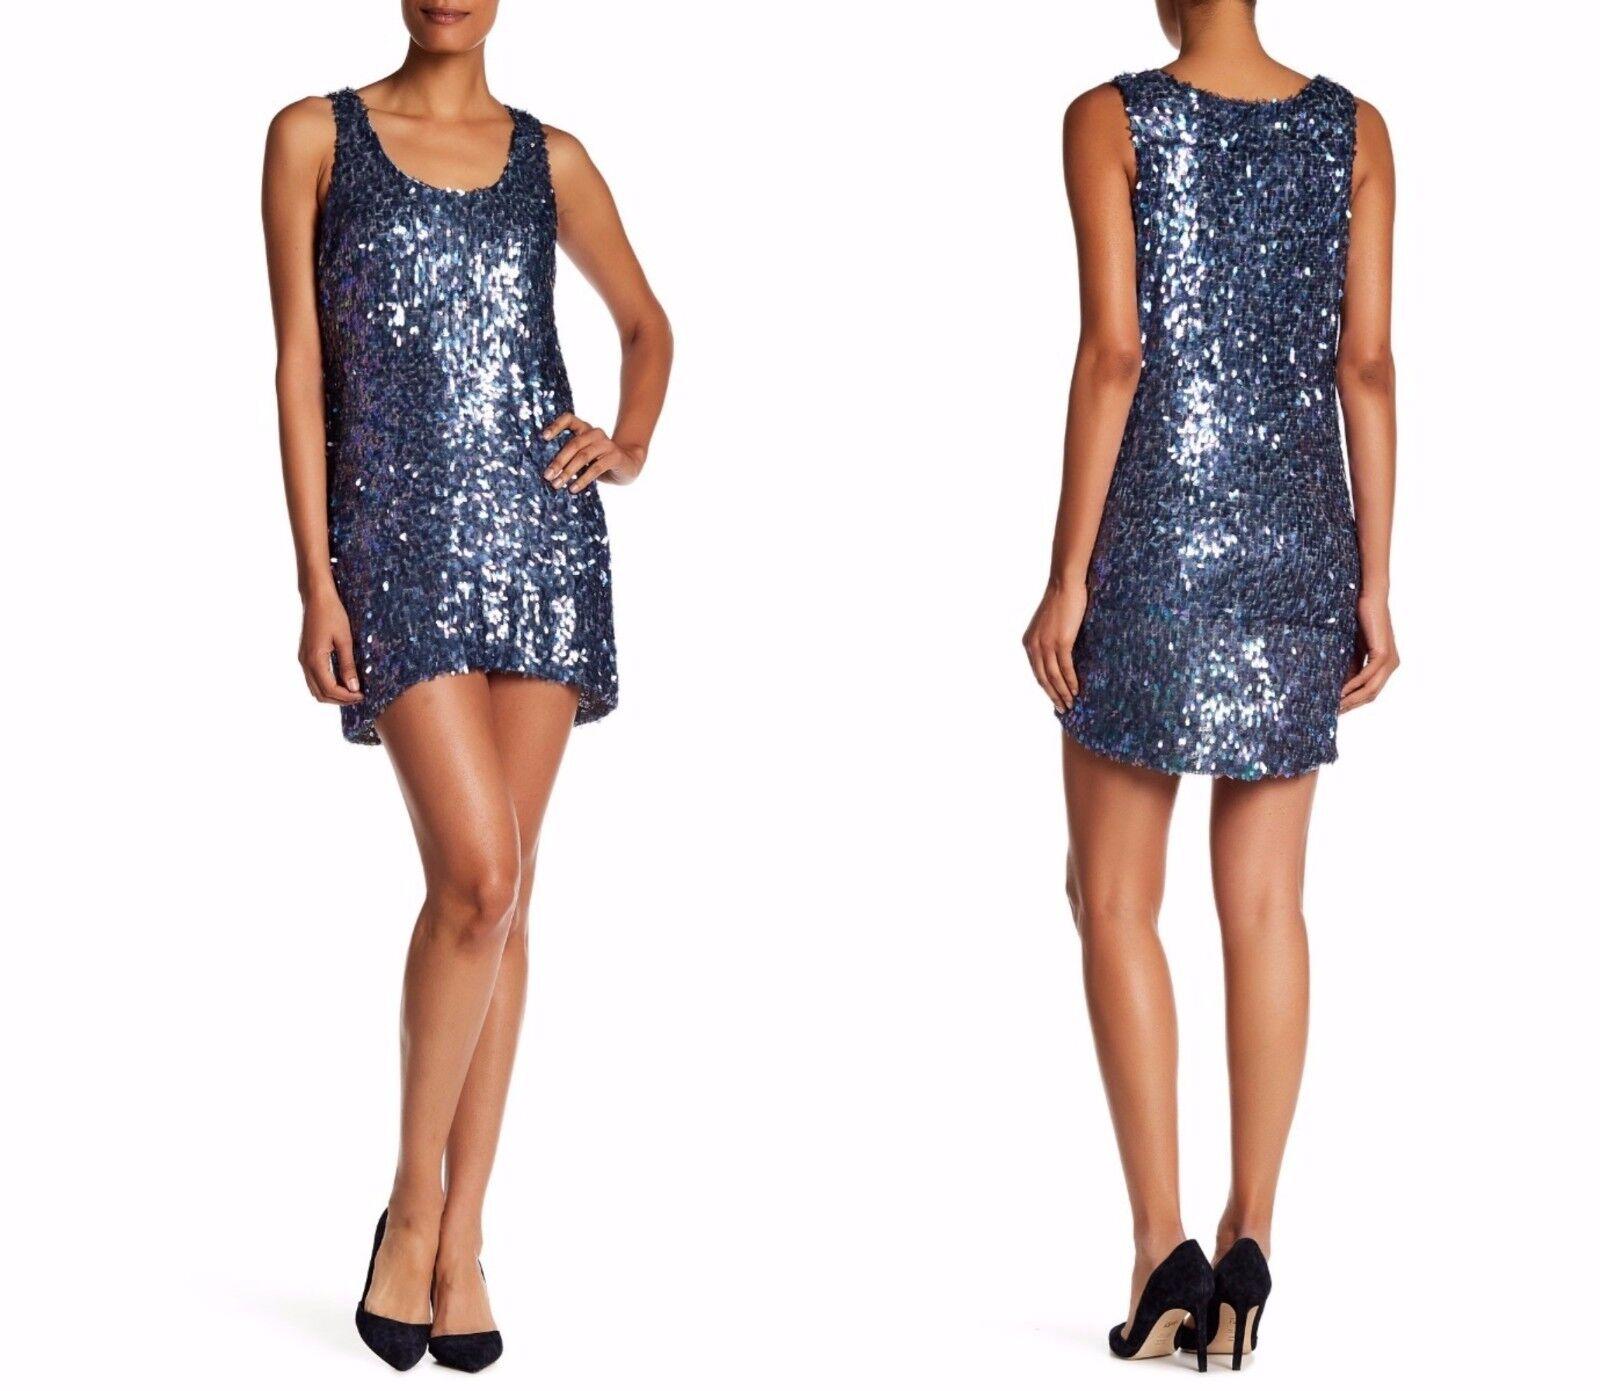 NEW Dress the Population 'Leah' Sequined Shift Dress Ice [SZ Medium]  E116